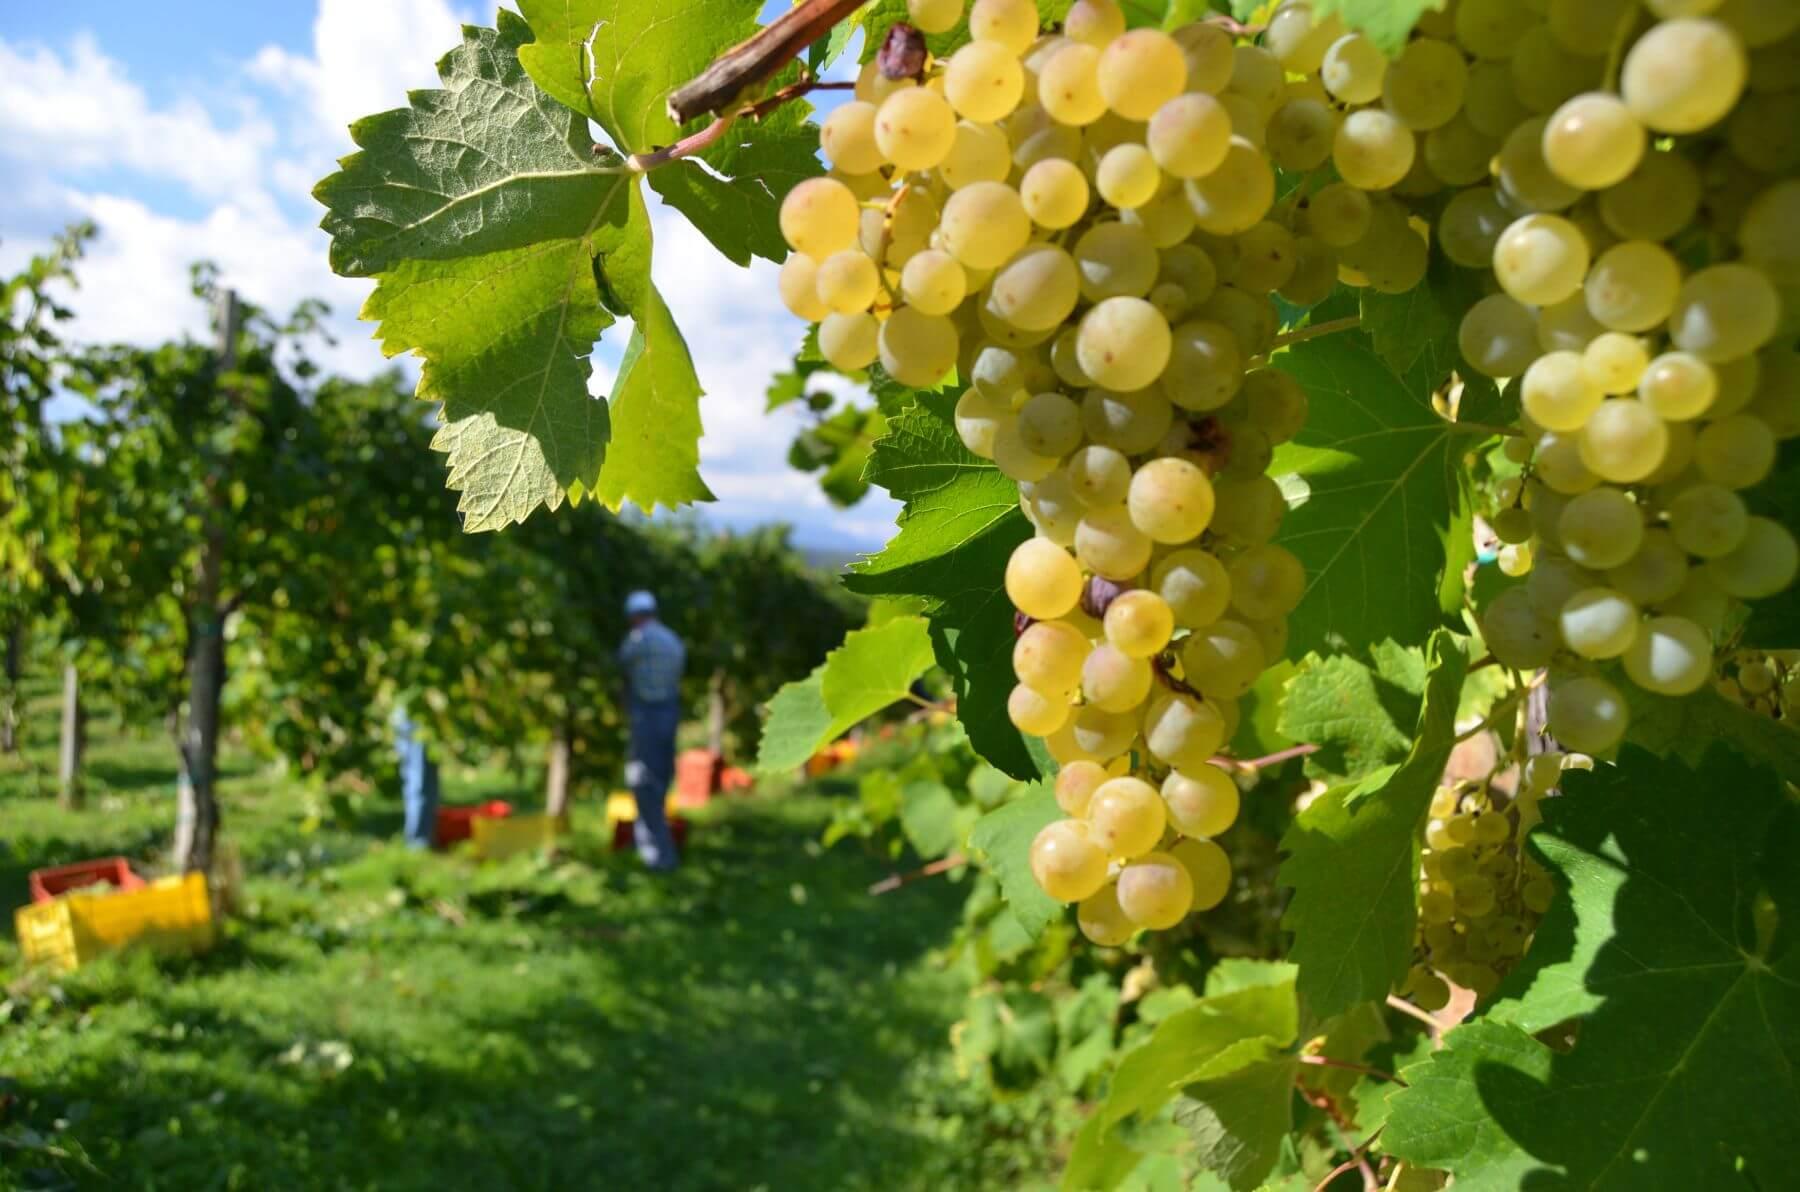 Wine grapes from the Prosecco region